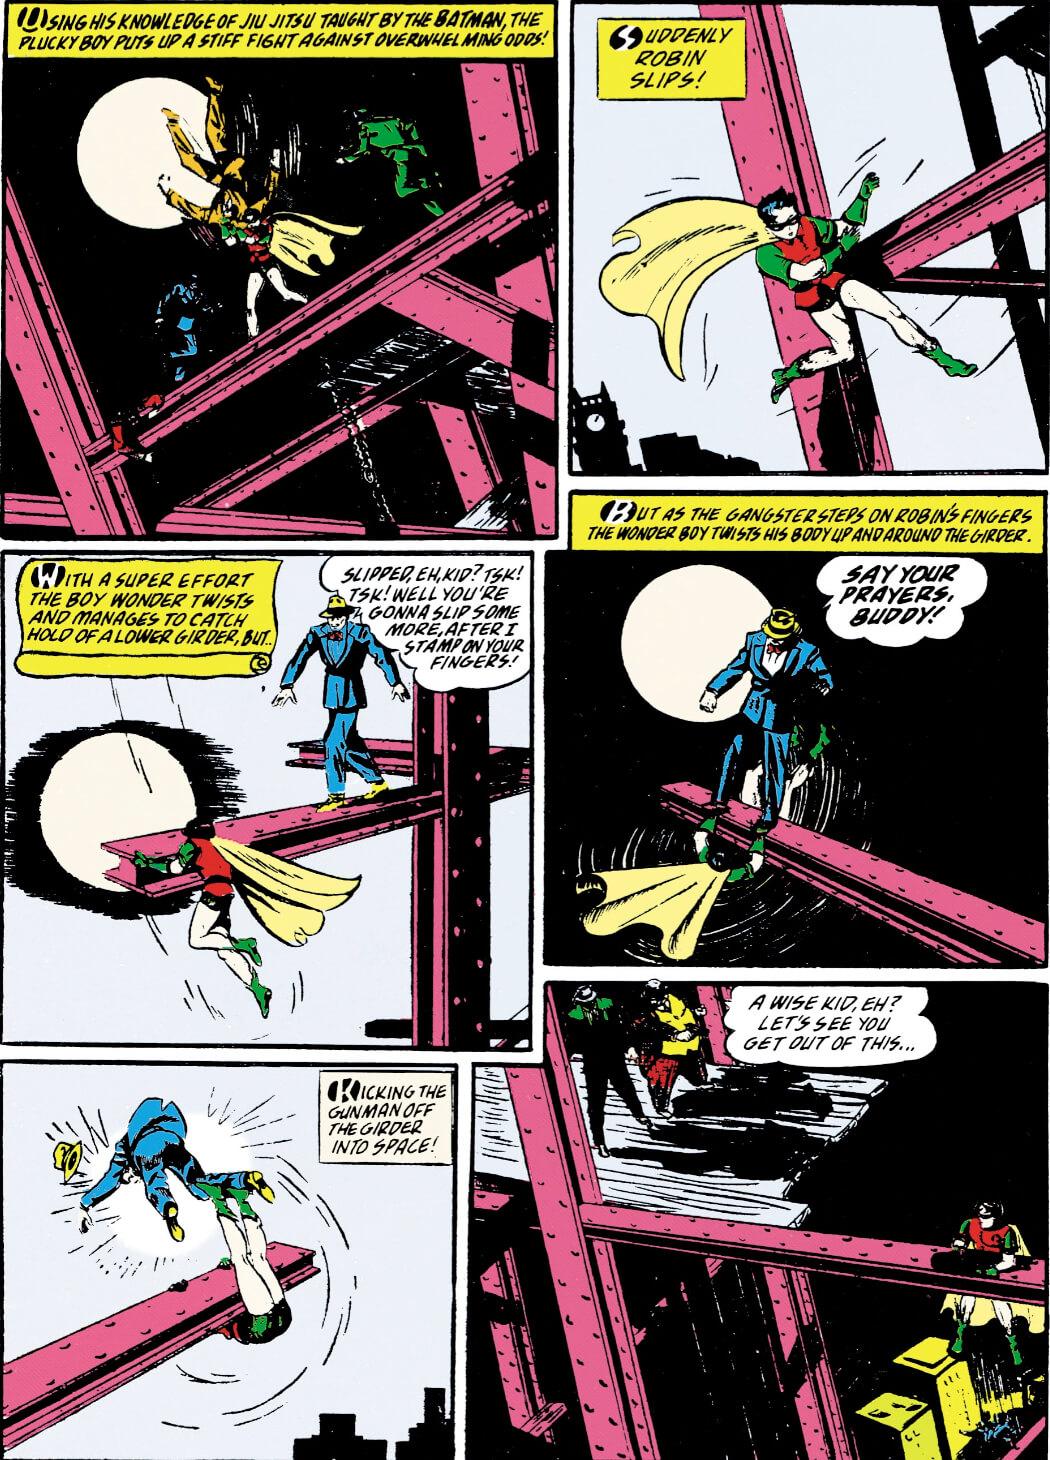 detective comics 38.jpg